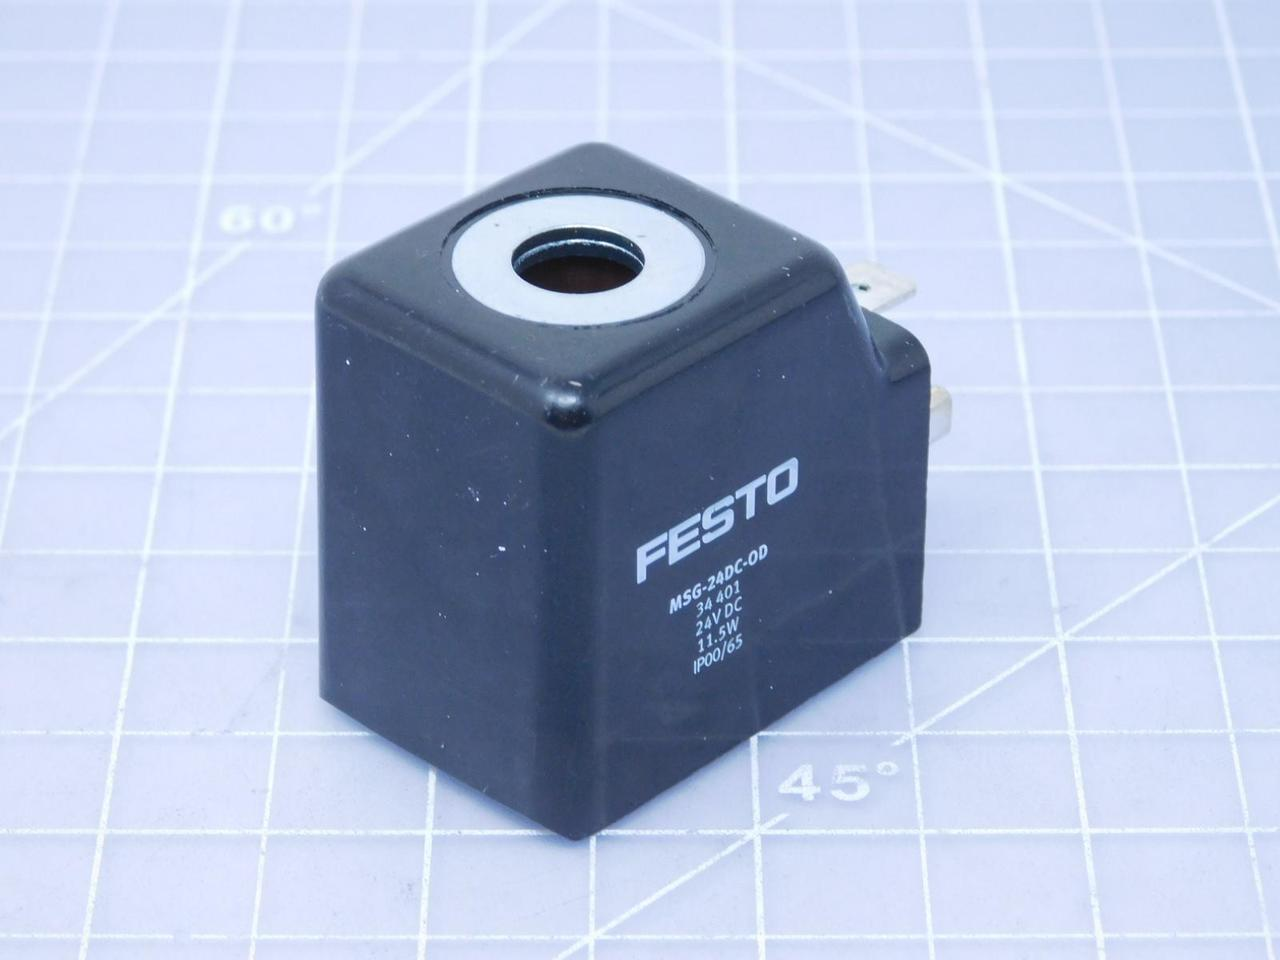 Festo MSG-24DC-0D Solenoid coil 24 VDC 11 5 W T132838